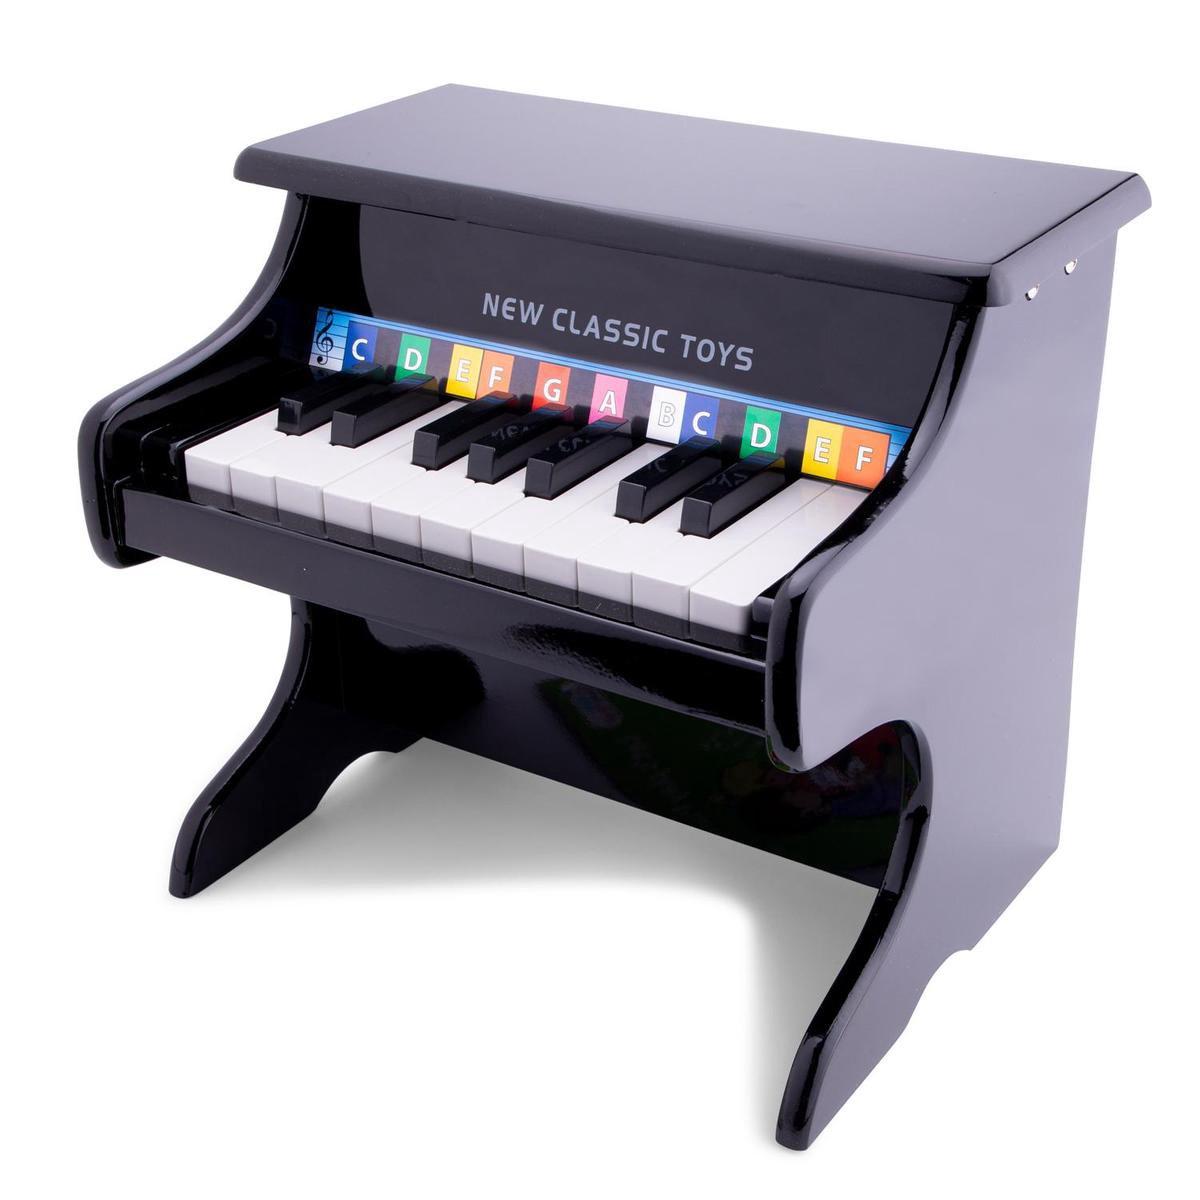 New Classic Toys - Speelgoed Piano - Zwart